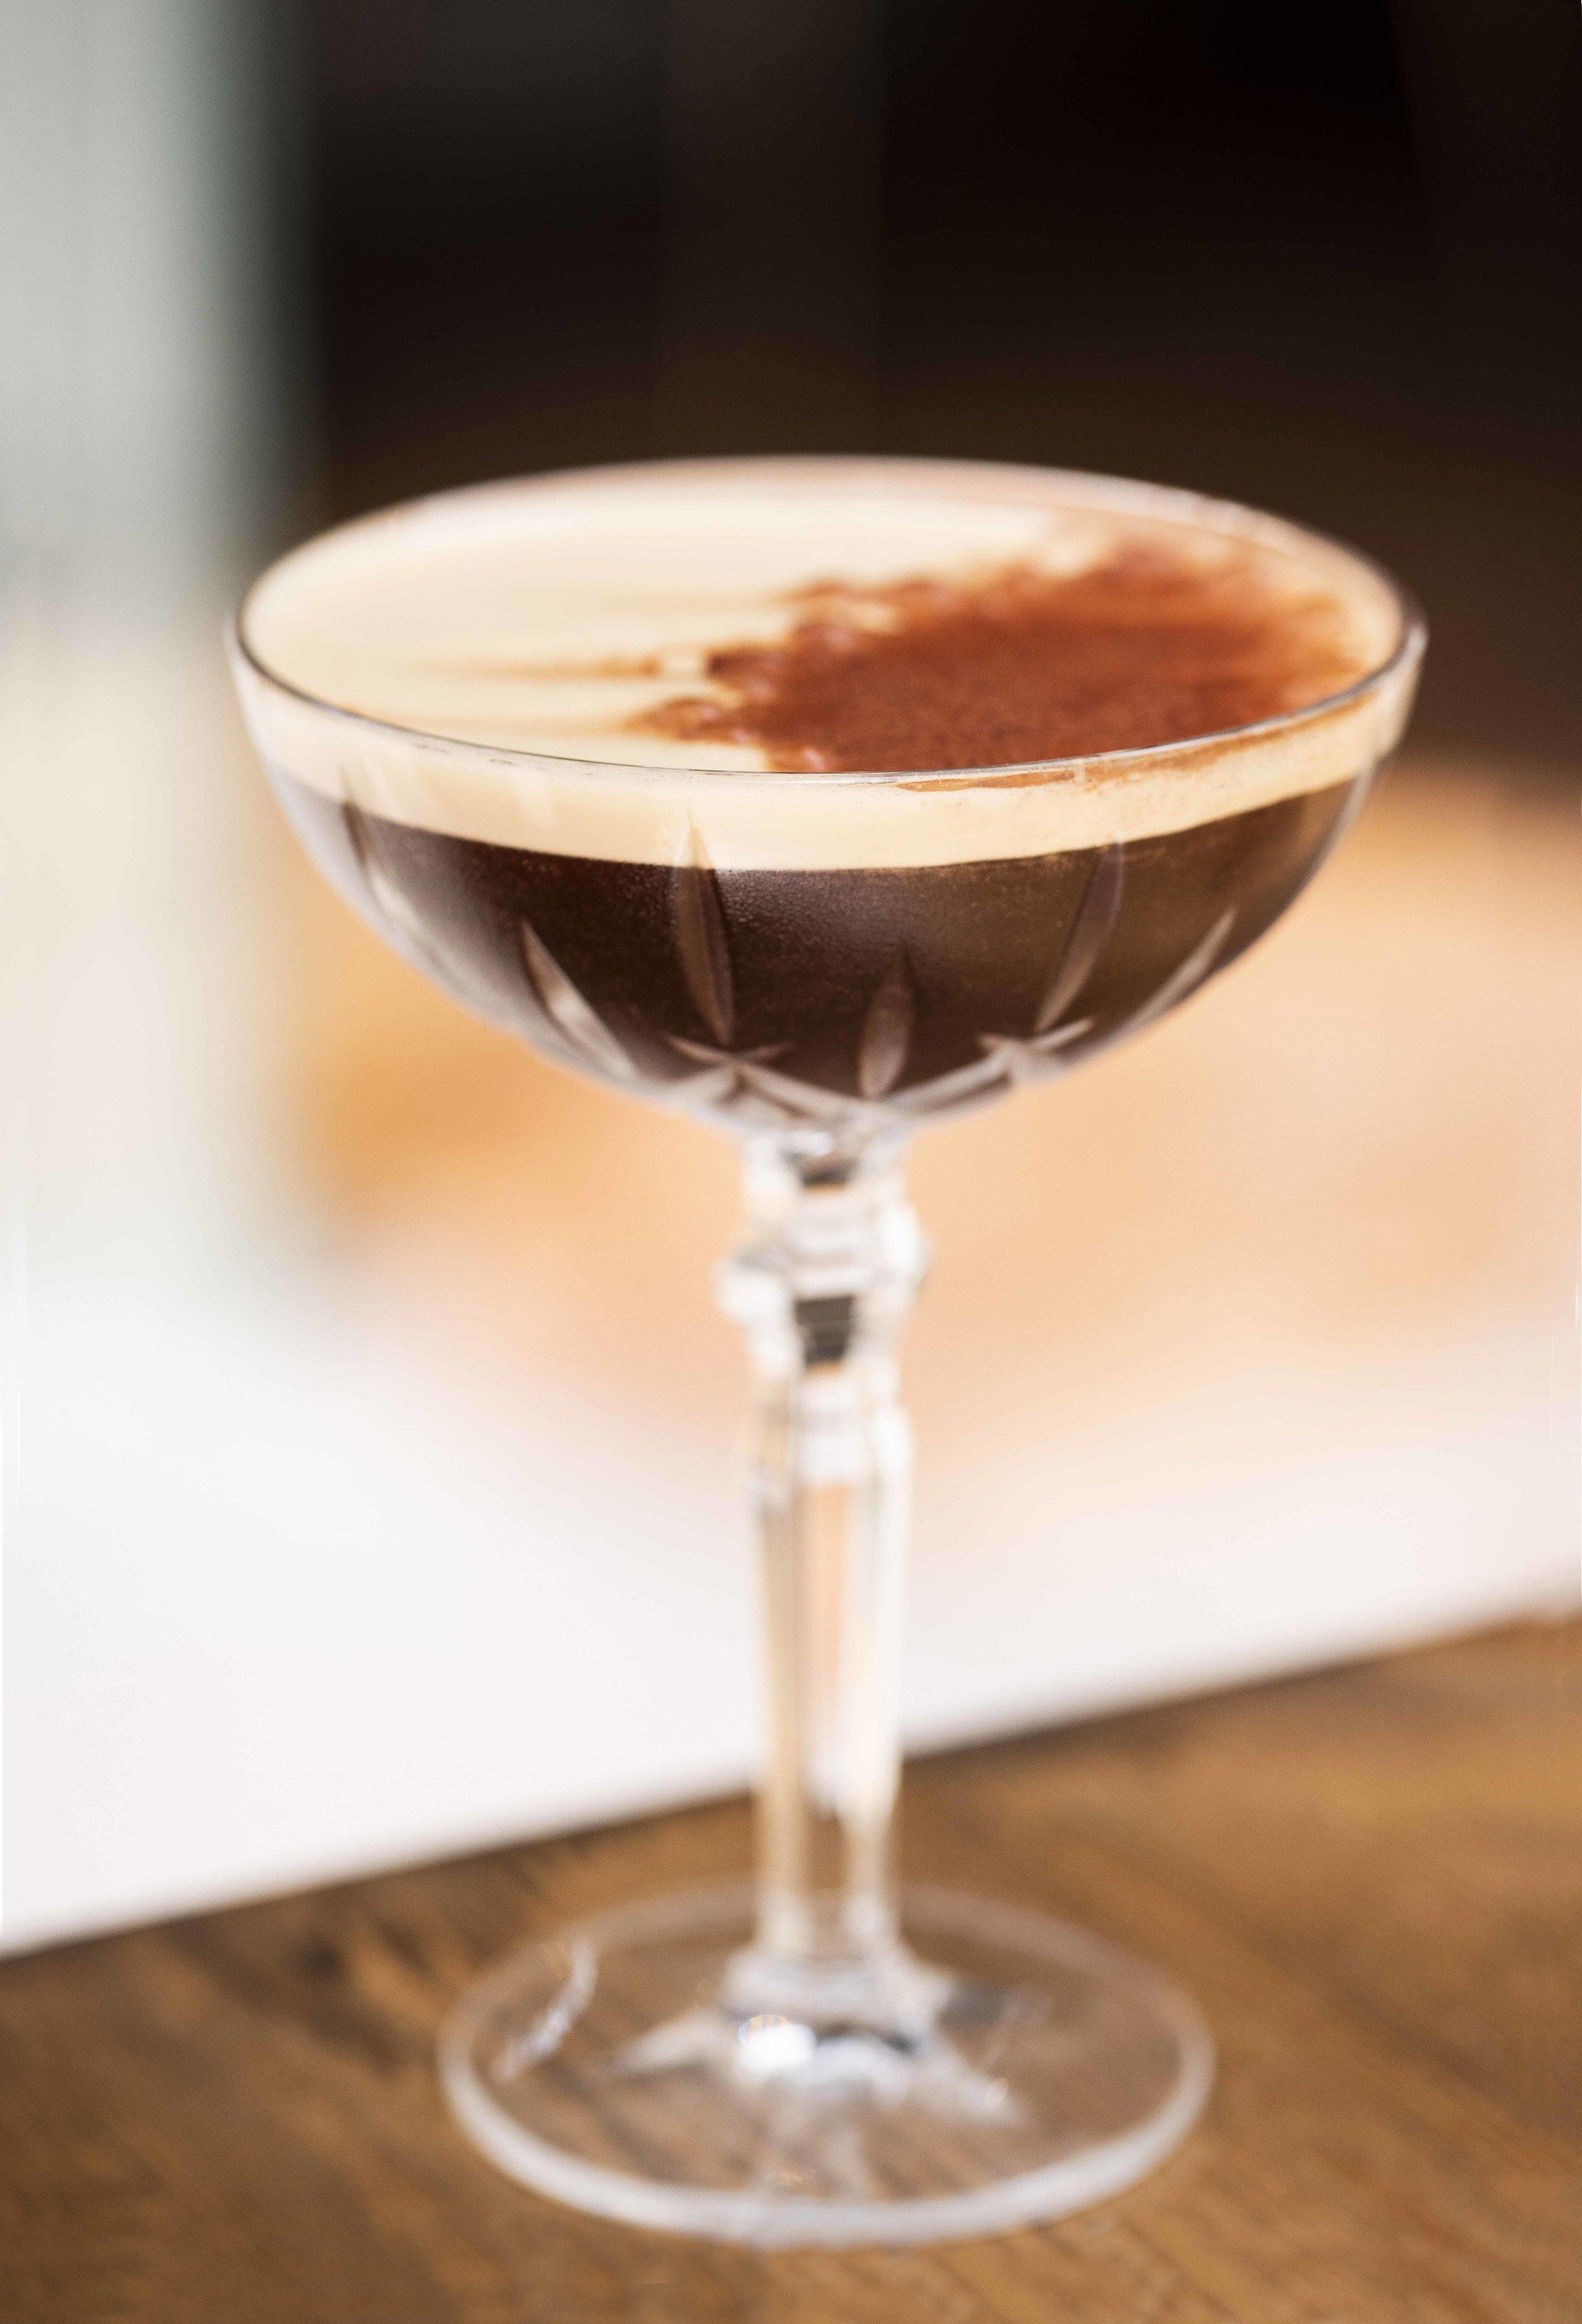 Espresso Martini at Cremat 11, Barcelona. Photo © Barcelona Food Experience.